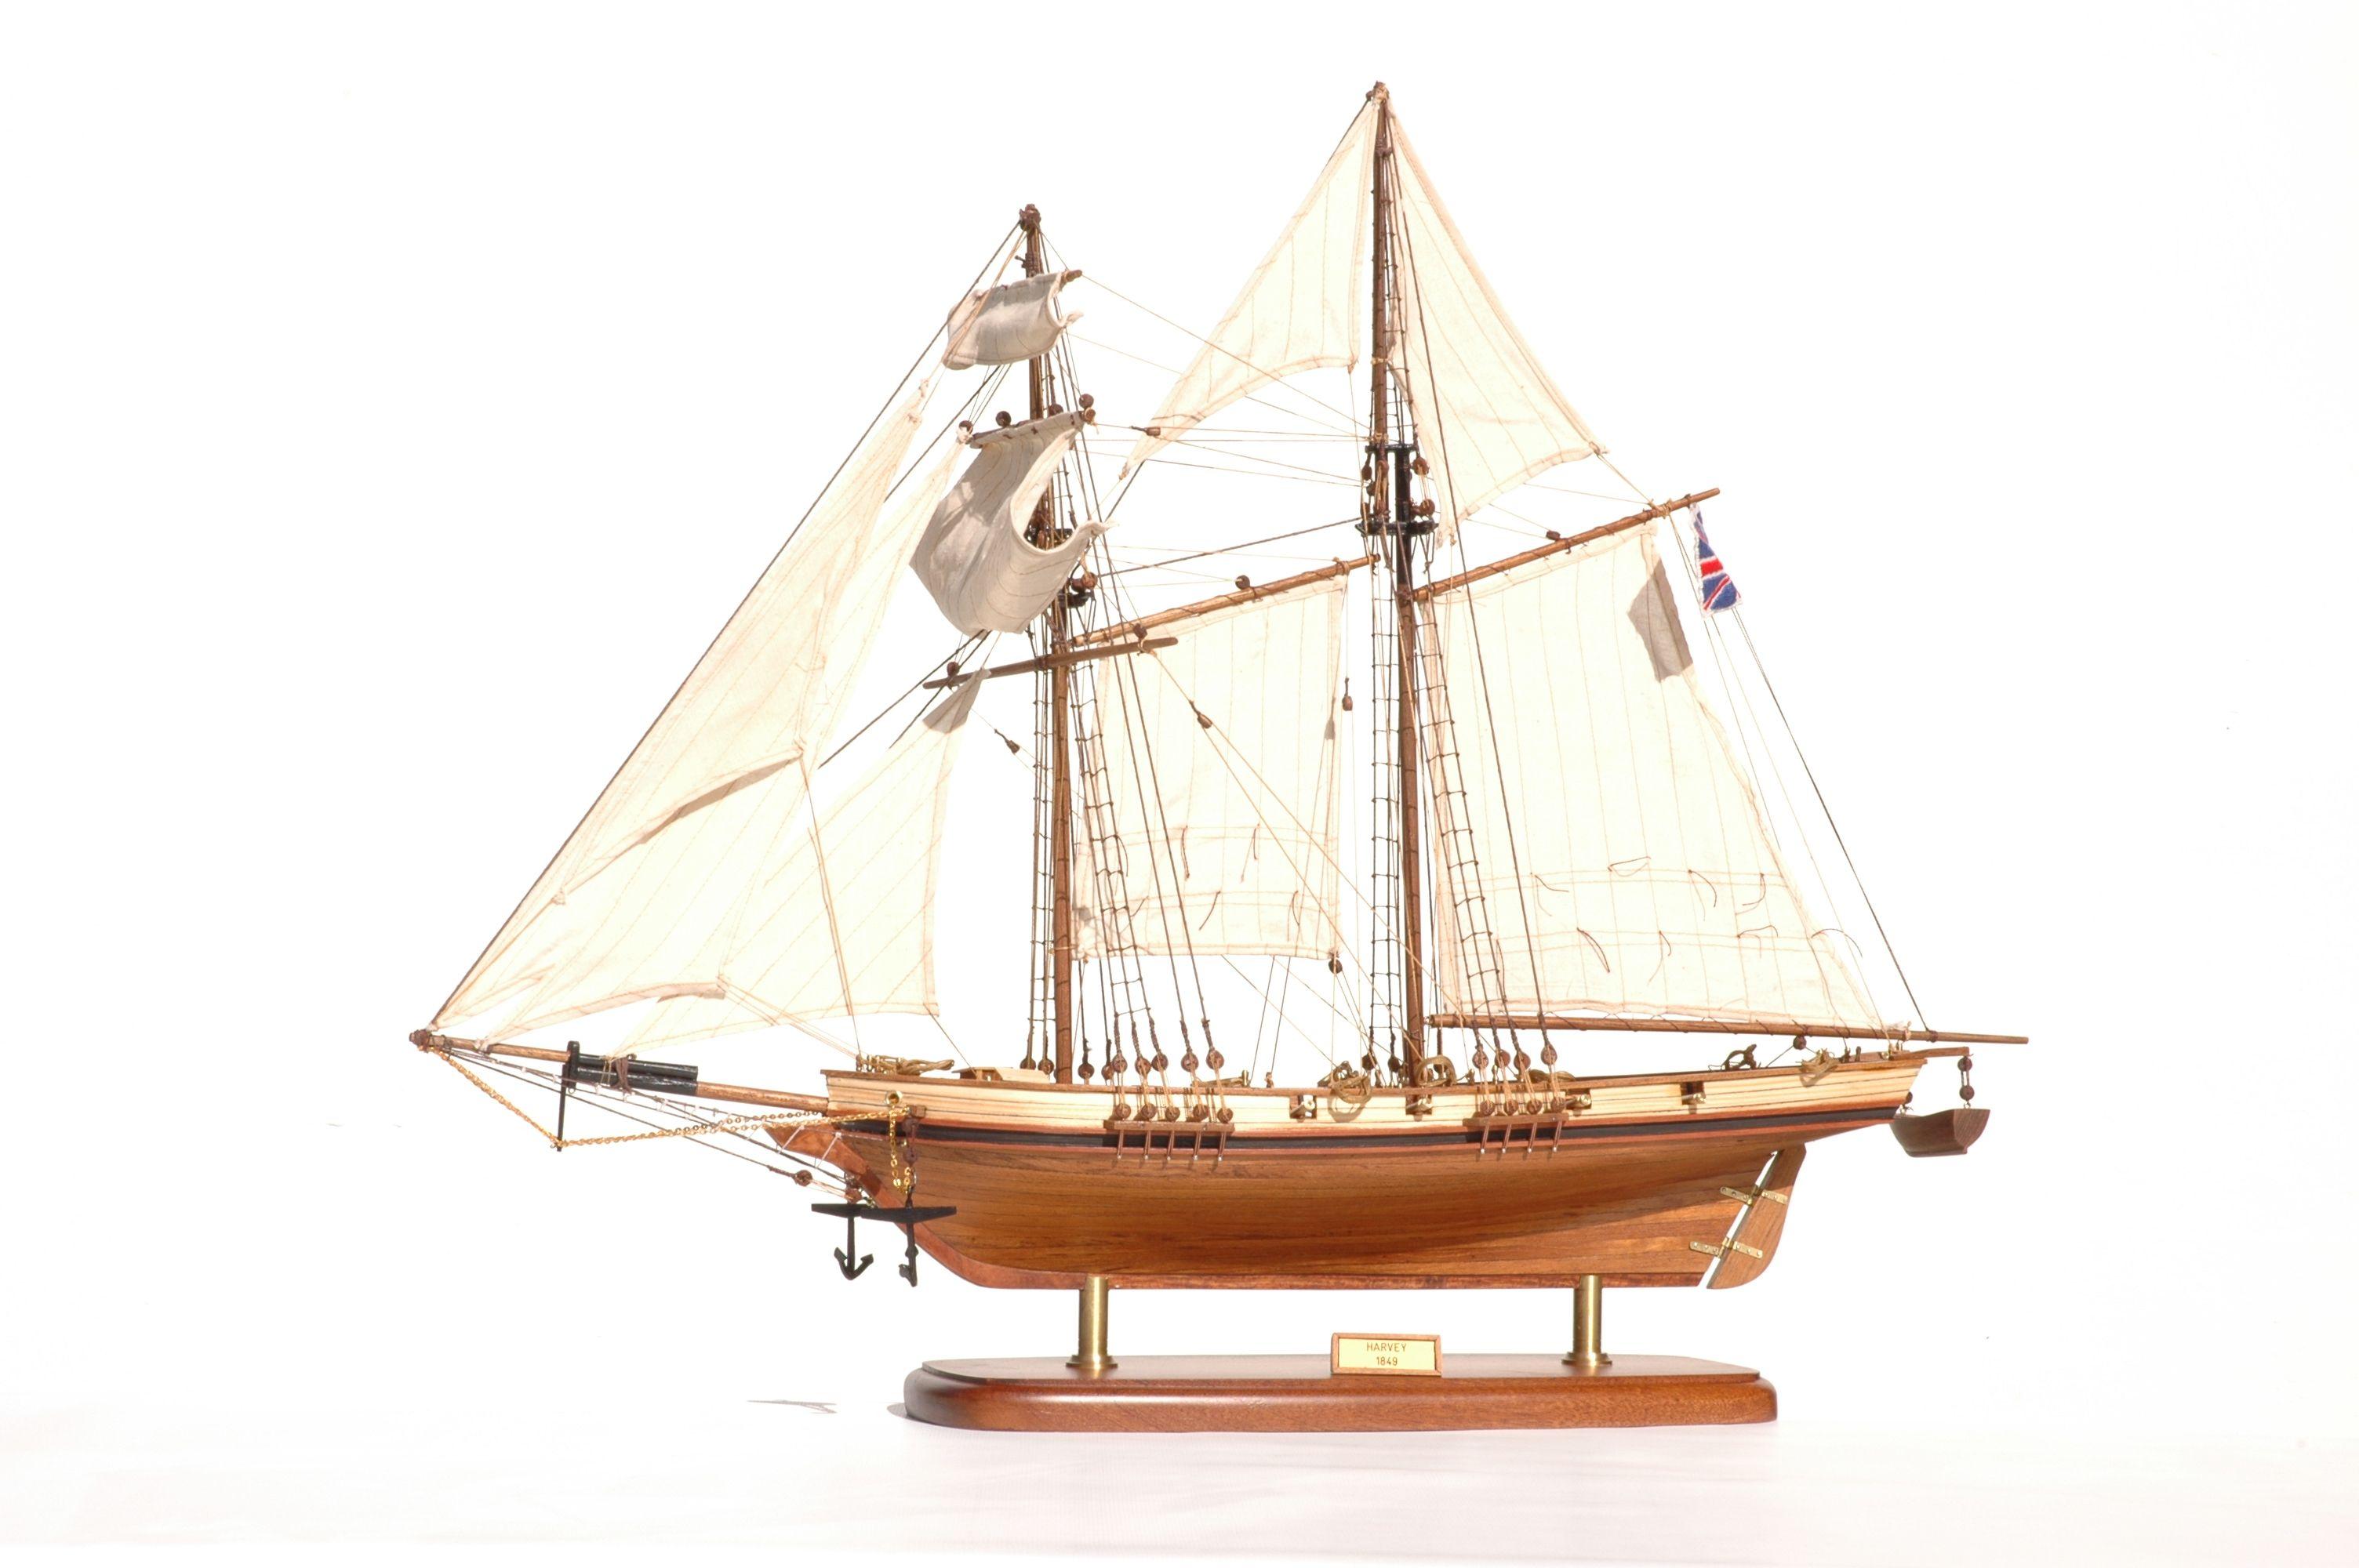 514-8303-Harvey-Model-Boat-Superior-Range